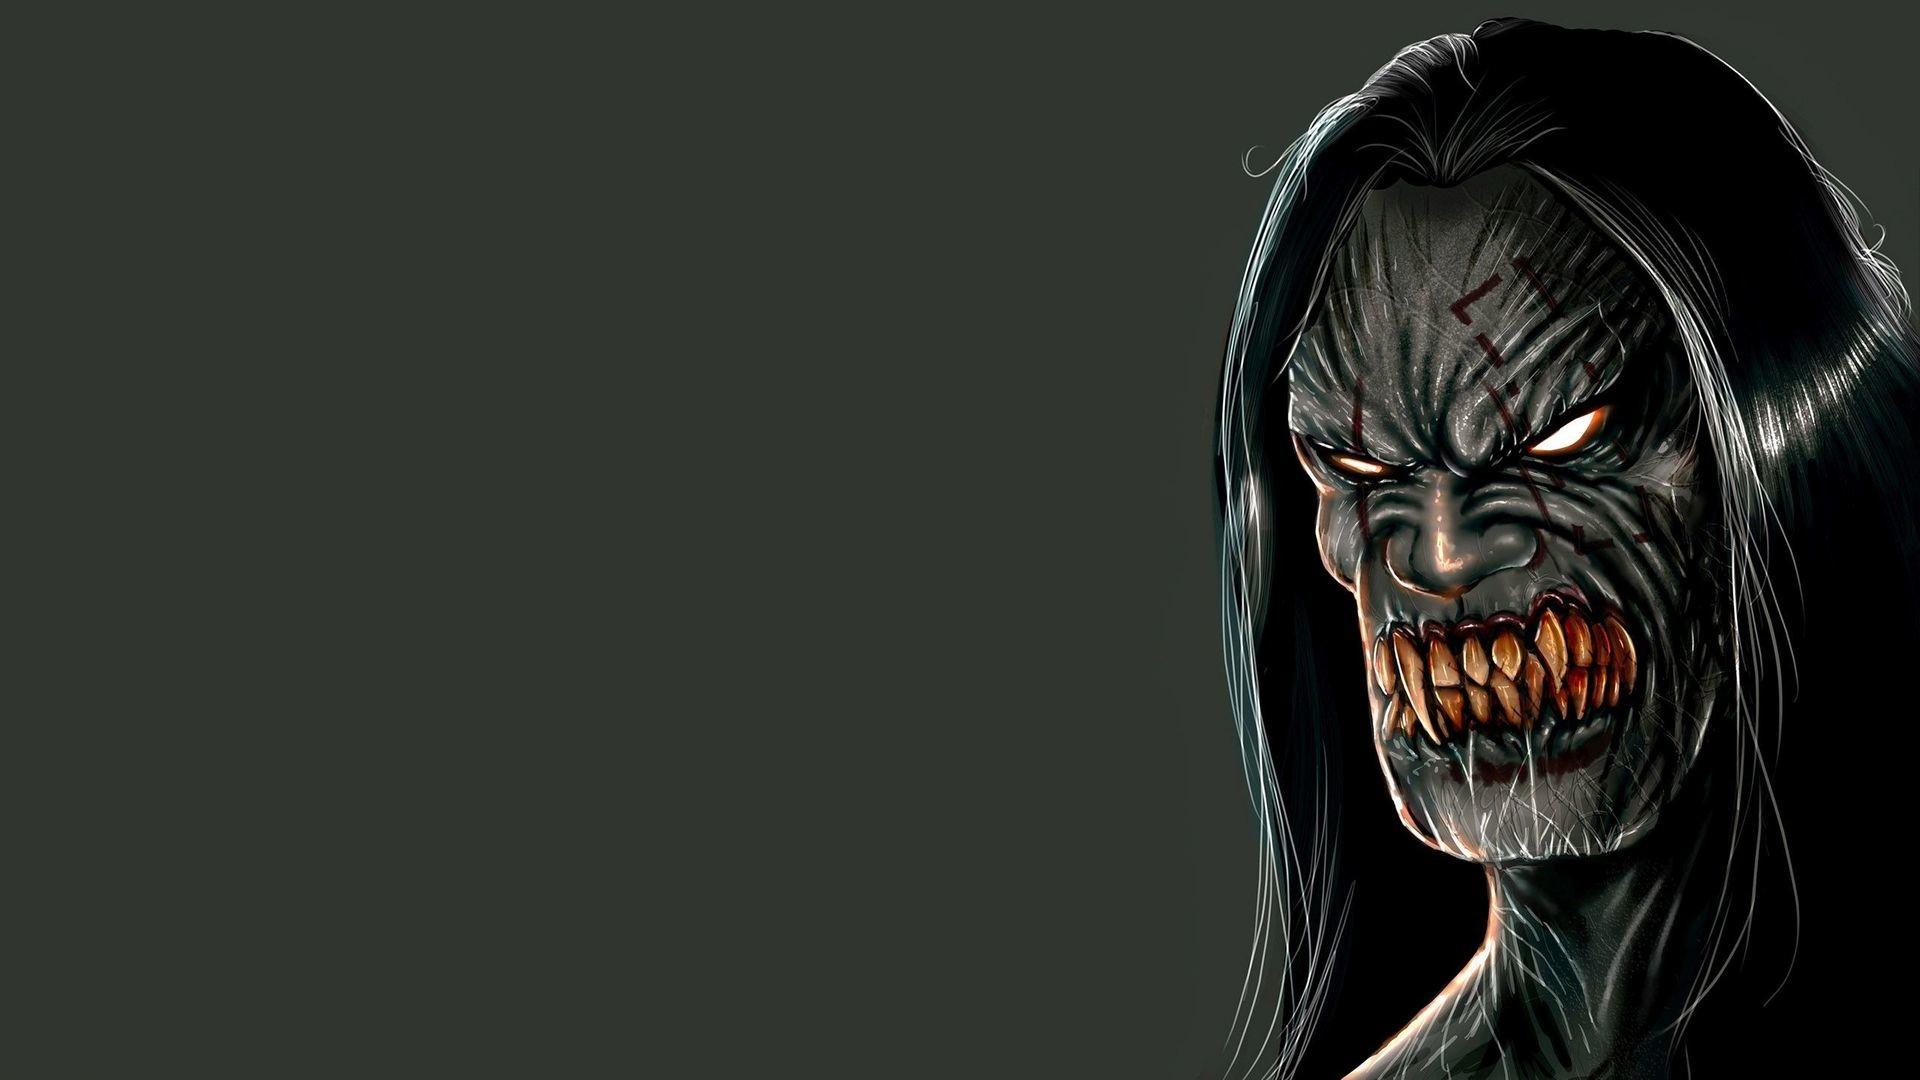 scary monster fantasy hd wallpaper 1920×1080 51045. ««